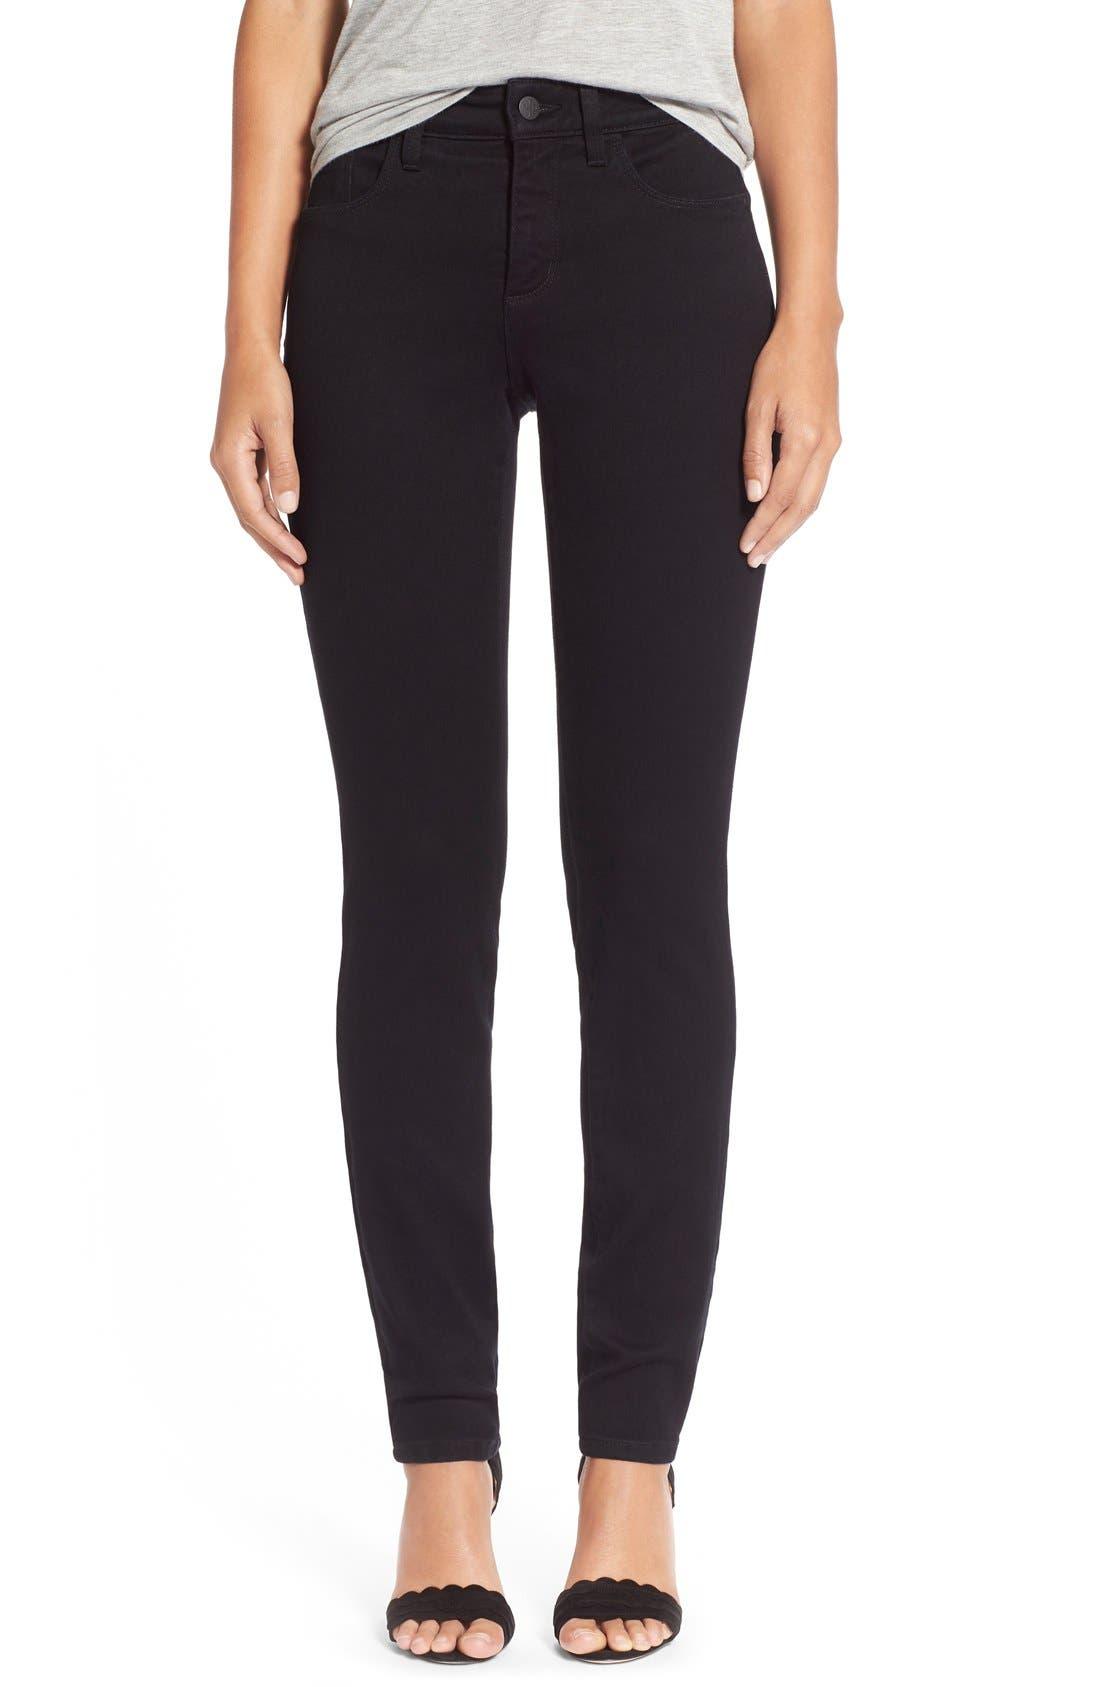 Main Image - NYDJ Alina Colored Stretch Skinny Jeans (Regular & Petite)